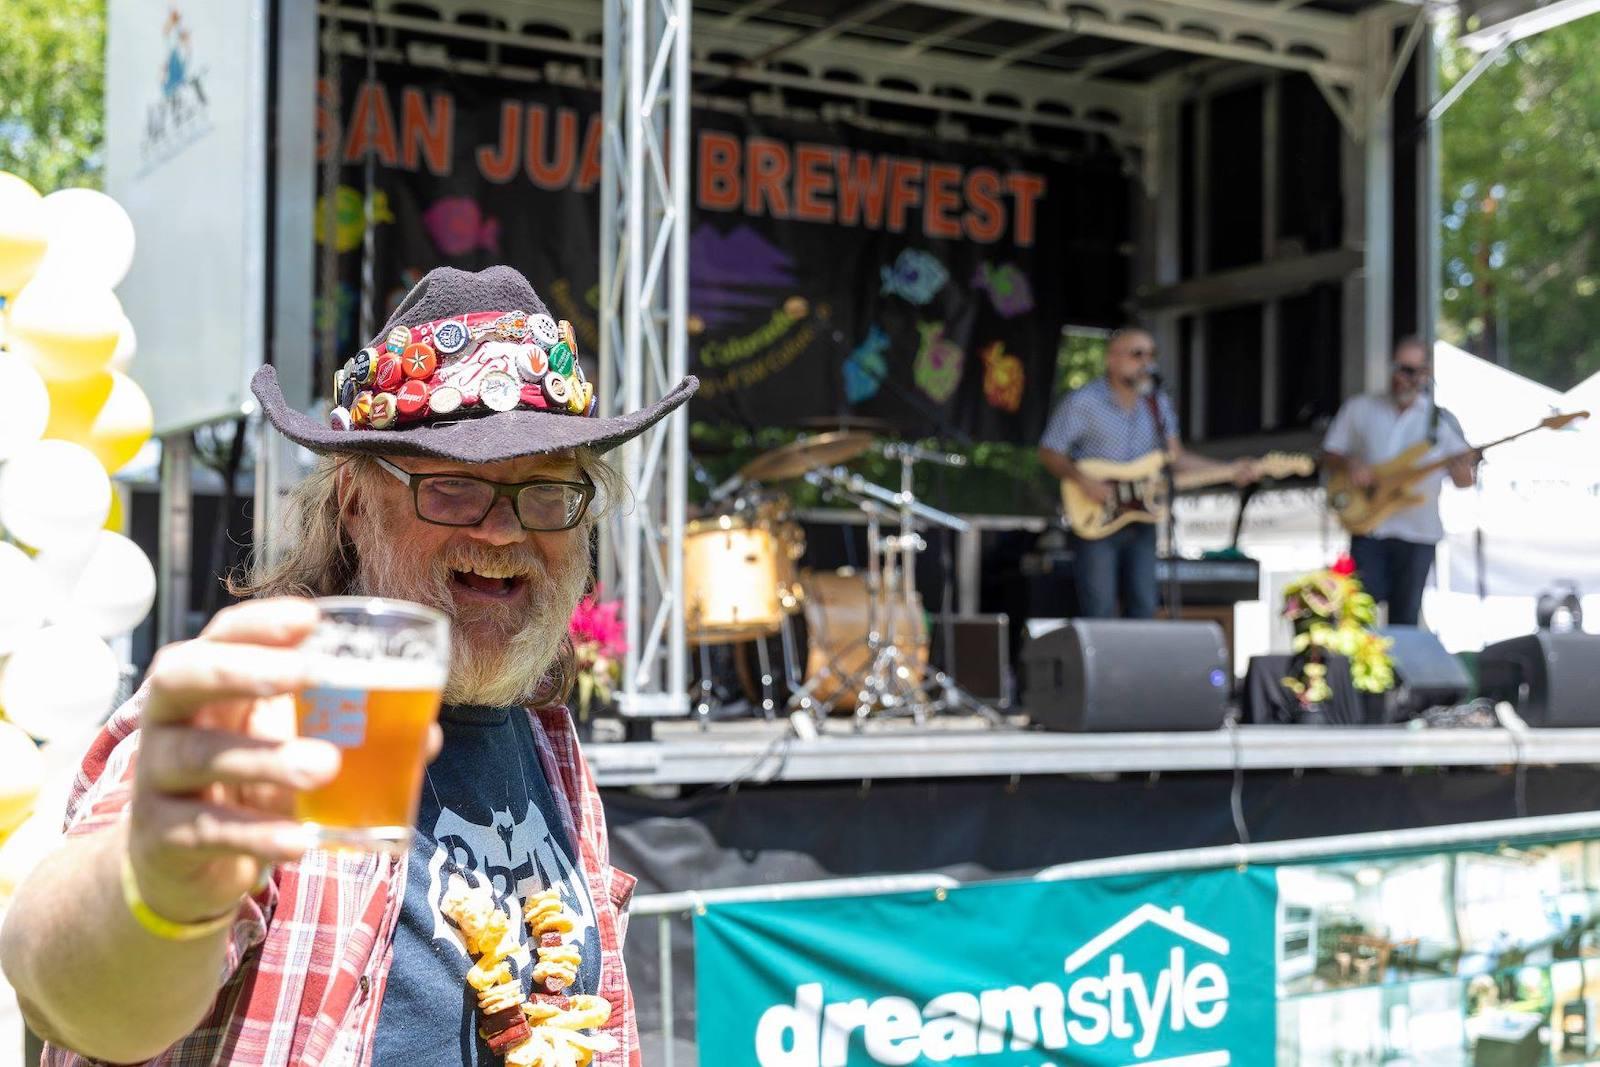 Image of a man enjoying a beer at the San Juan Brewfest in Durango, Colorado